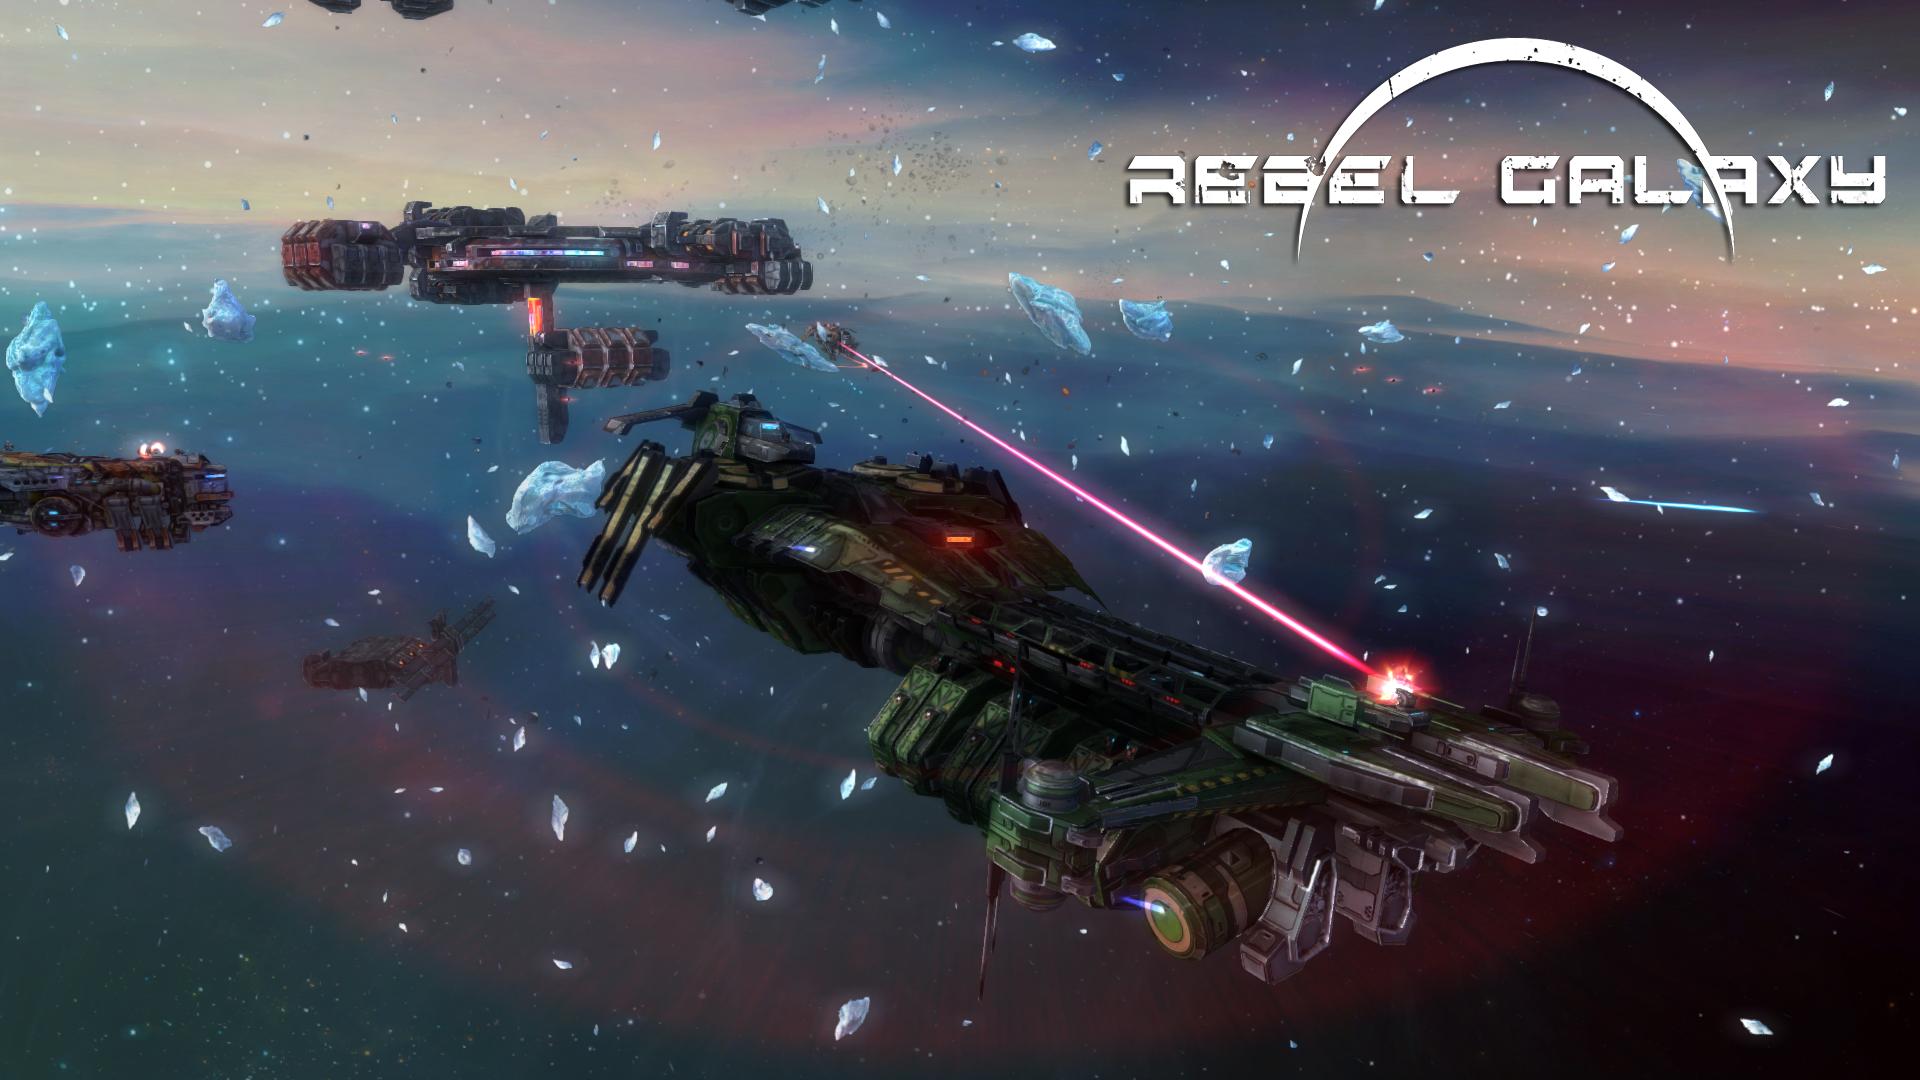 RebelGalaxy-review (2)